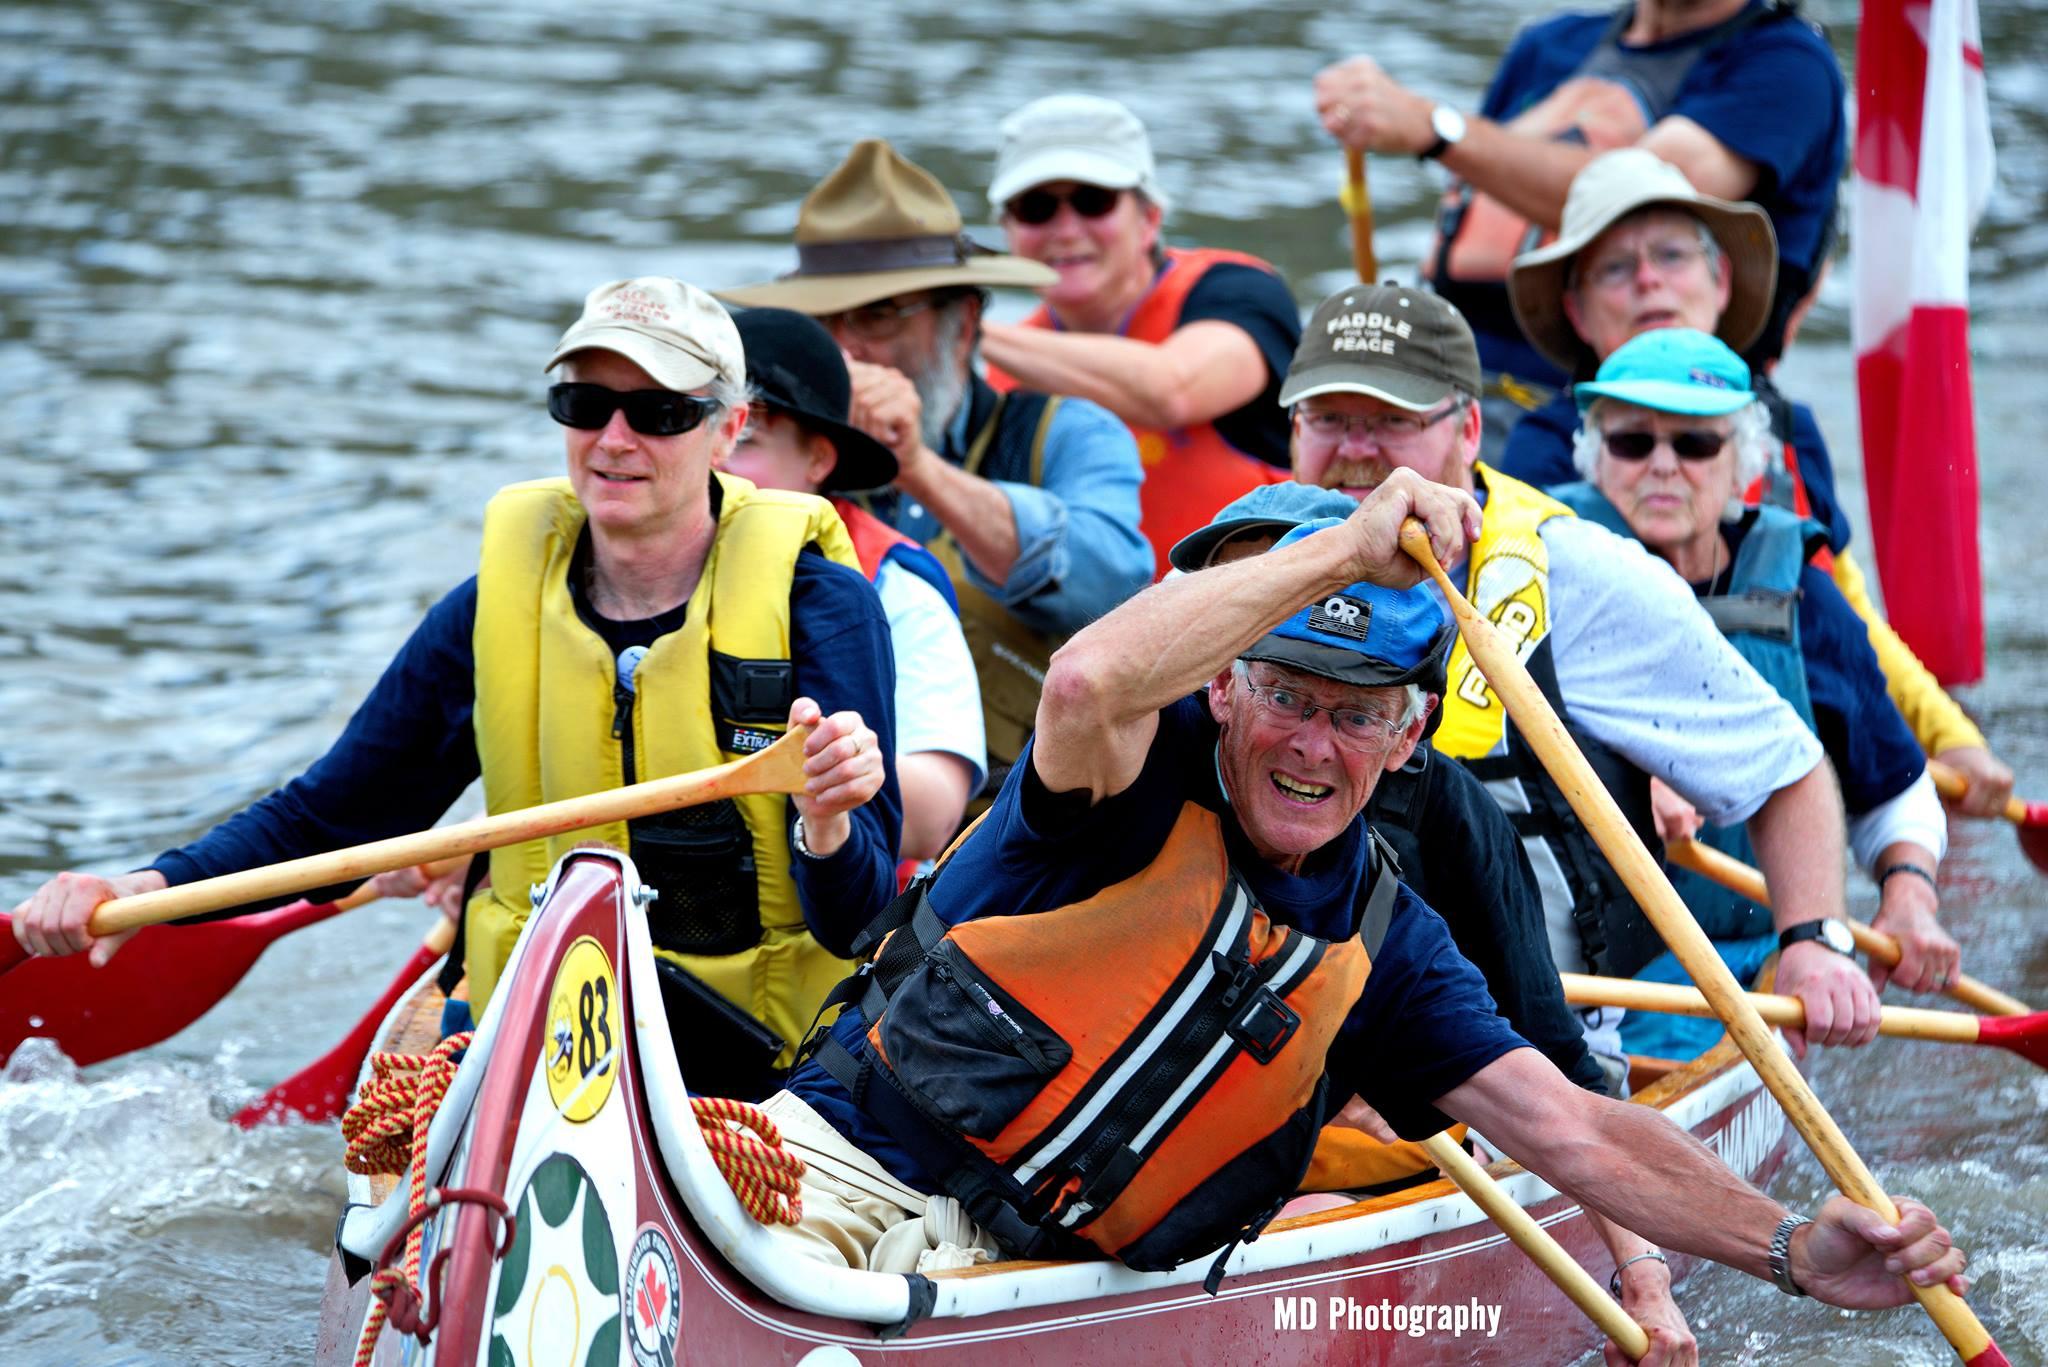 John braces canoe